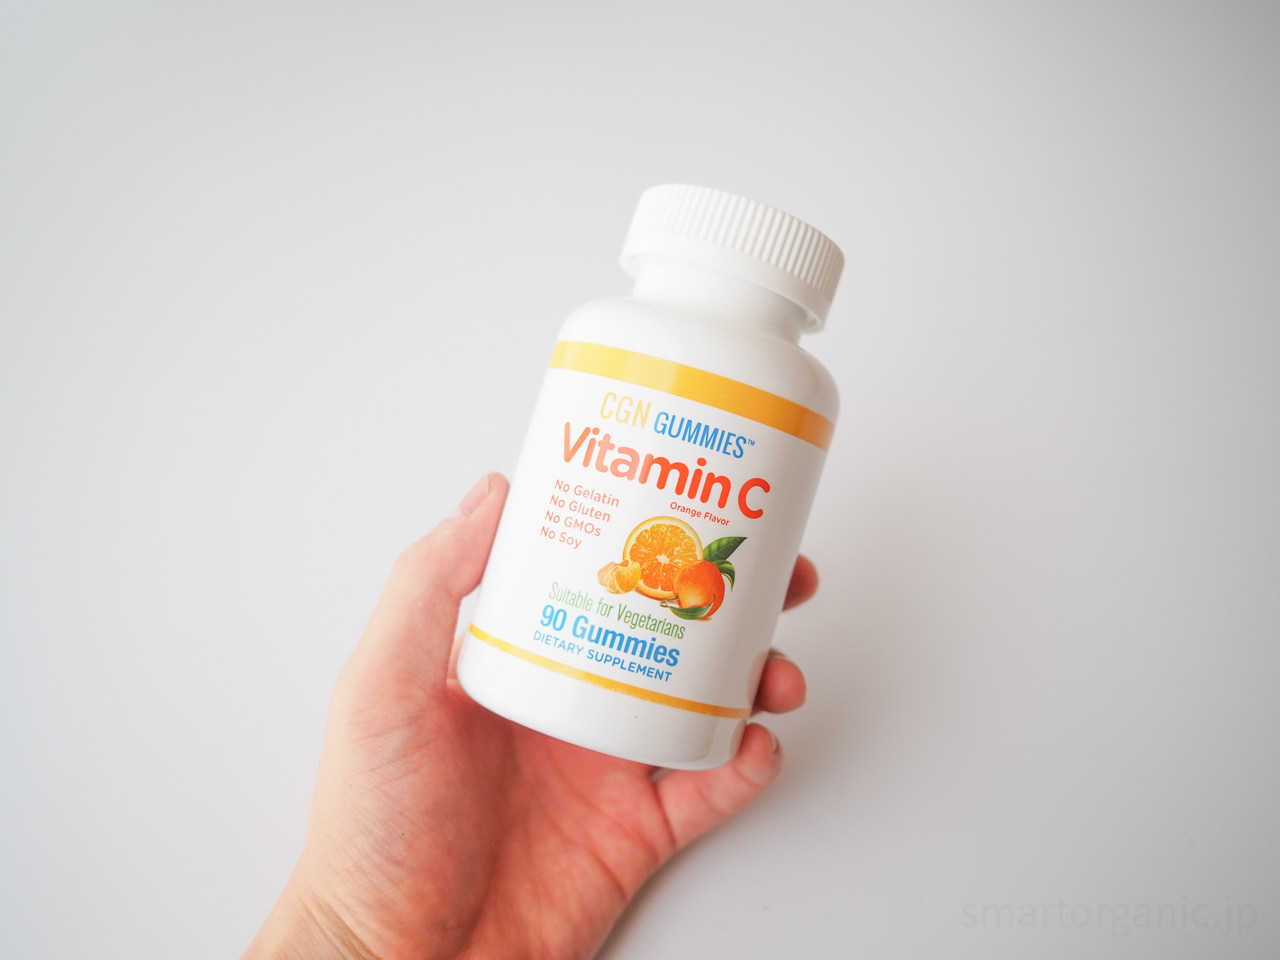 iHerbのビタミンCグミで手軽に栄養補給【オレンジ味で美味しい】